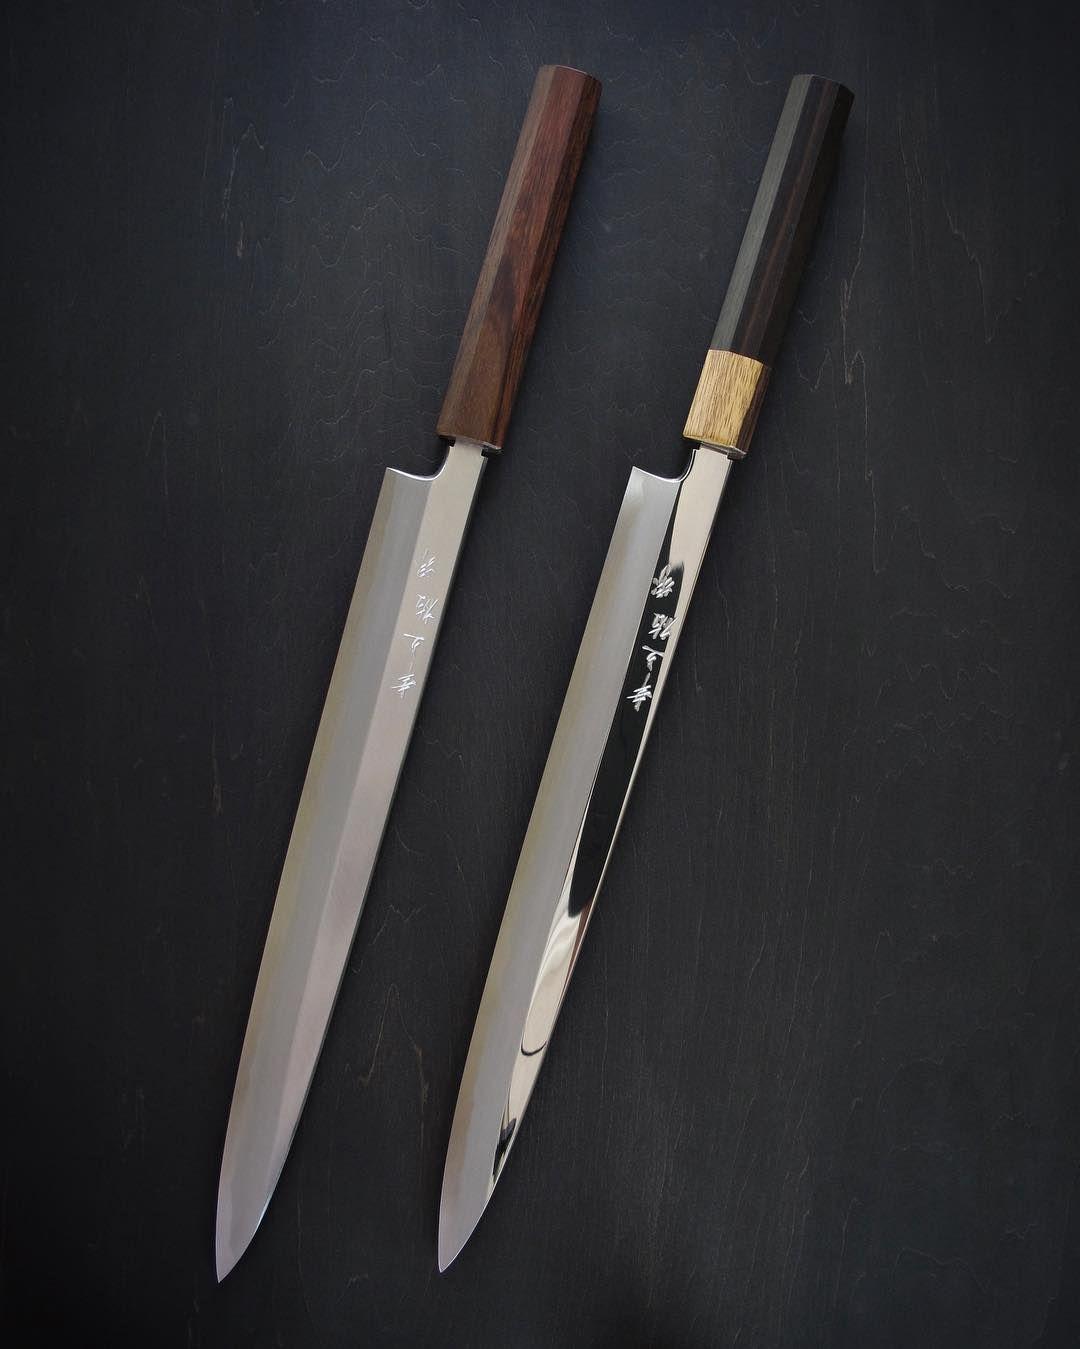 marko tsourkan gyutos cutlery pinterest knives and kitchen fujiyama series yanagiba with khii ebony and rosewood handles kitchen kniveshandle